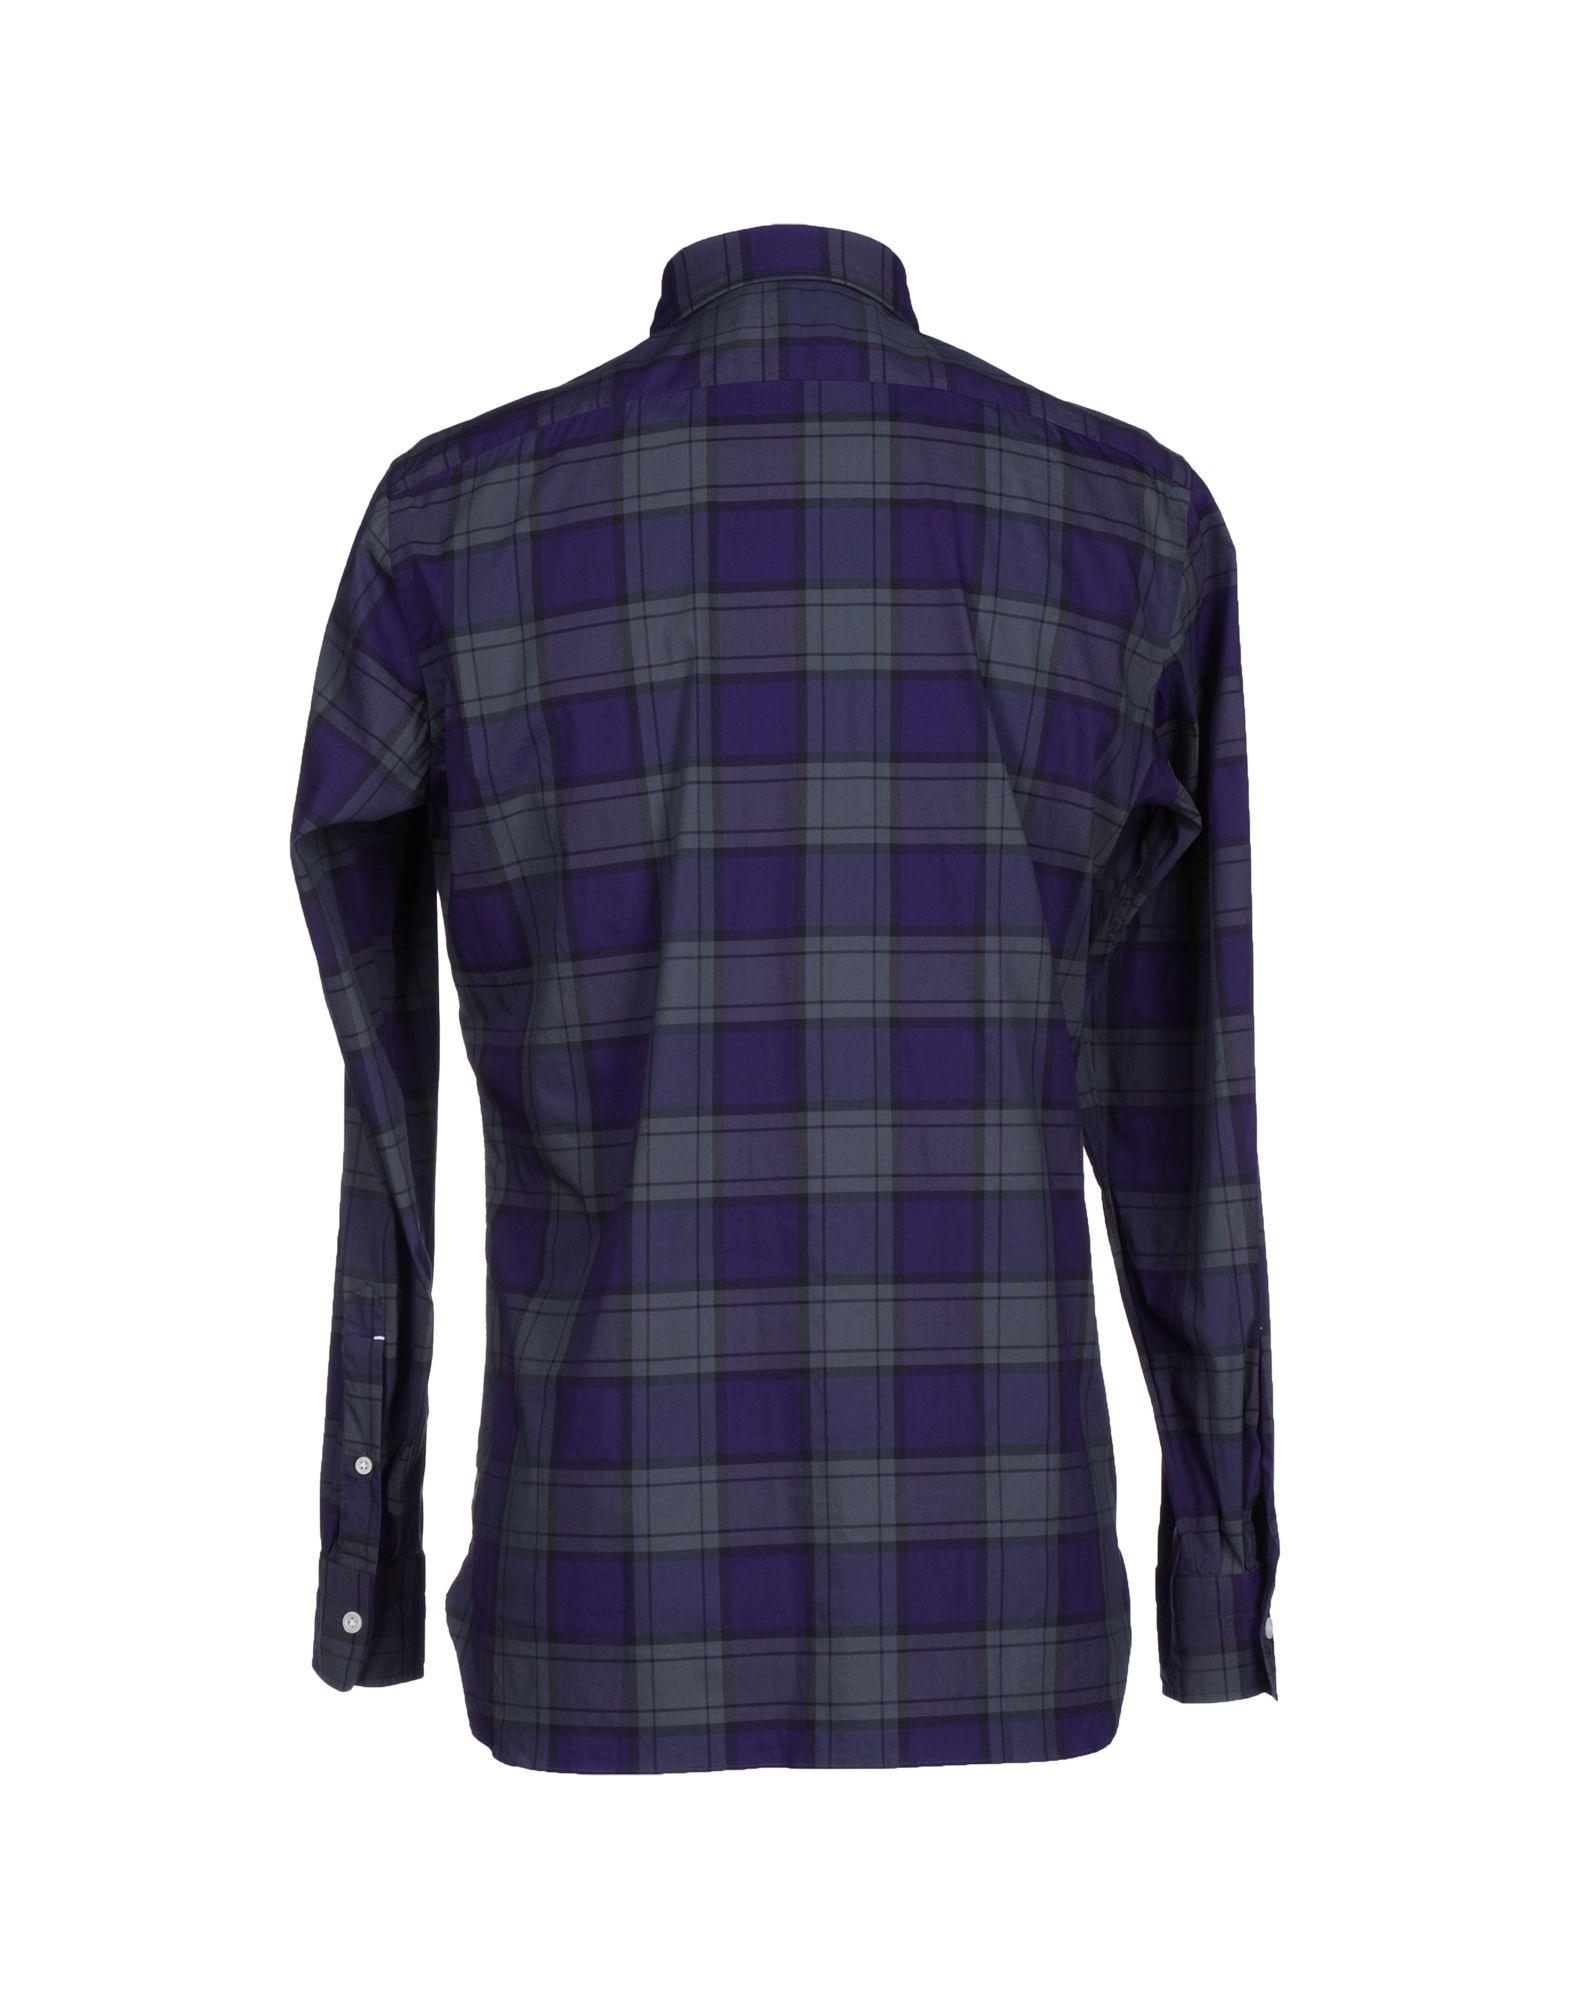 Luigi Borrelli Napoli Shirt In Purple For Men Lyst